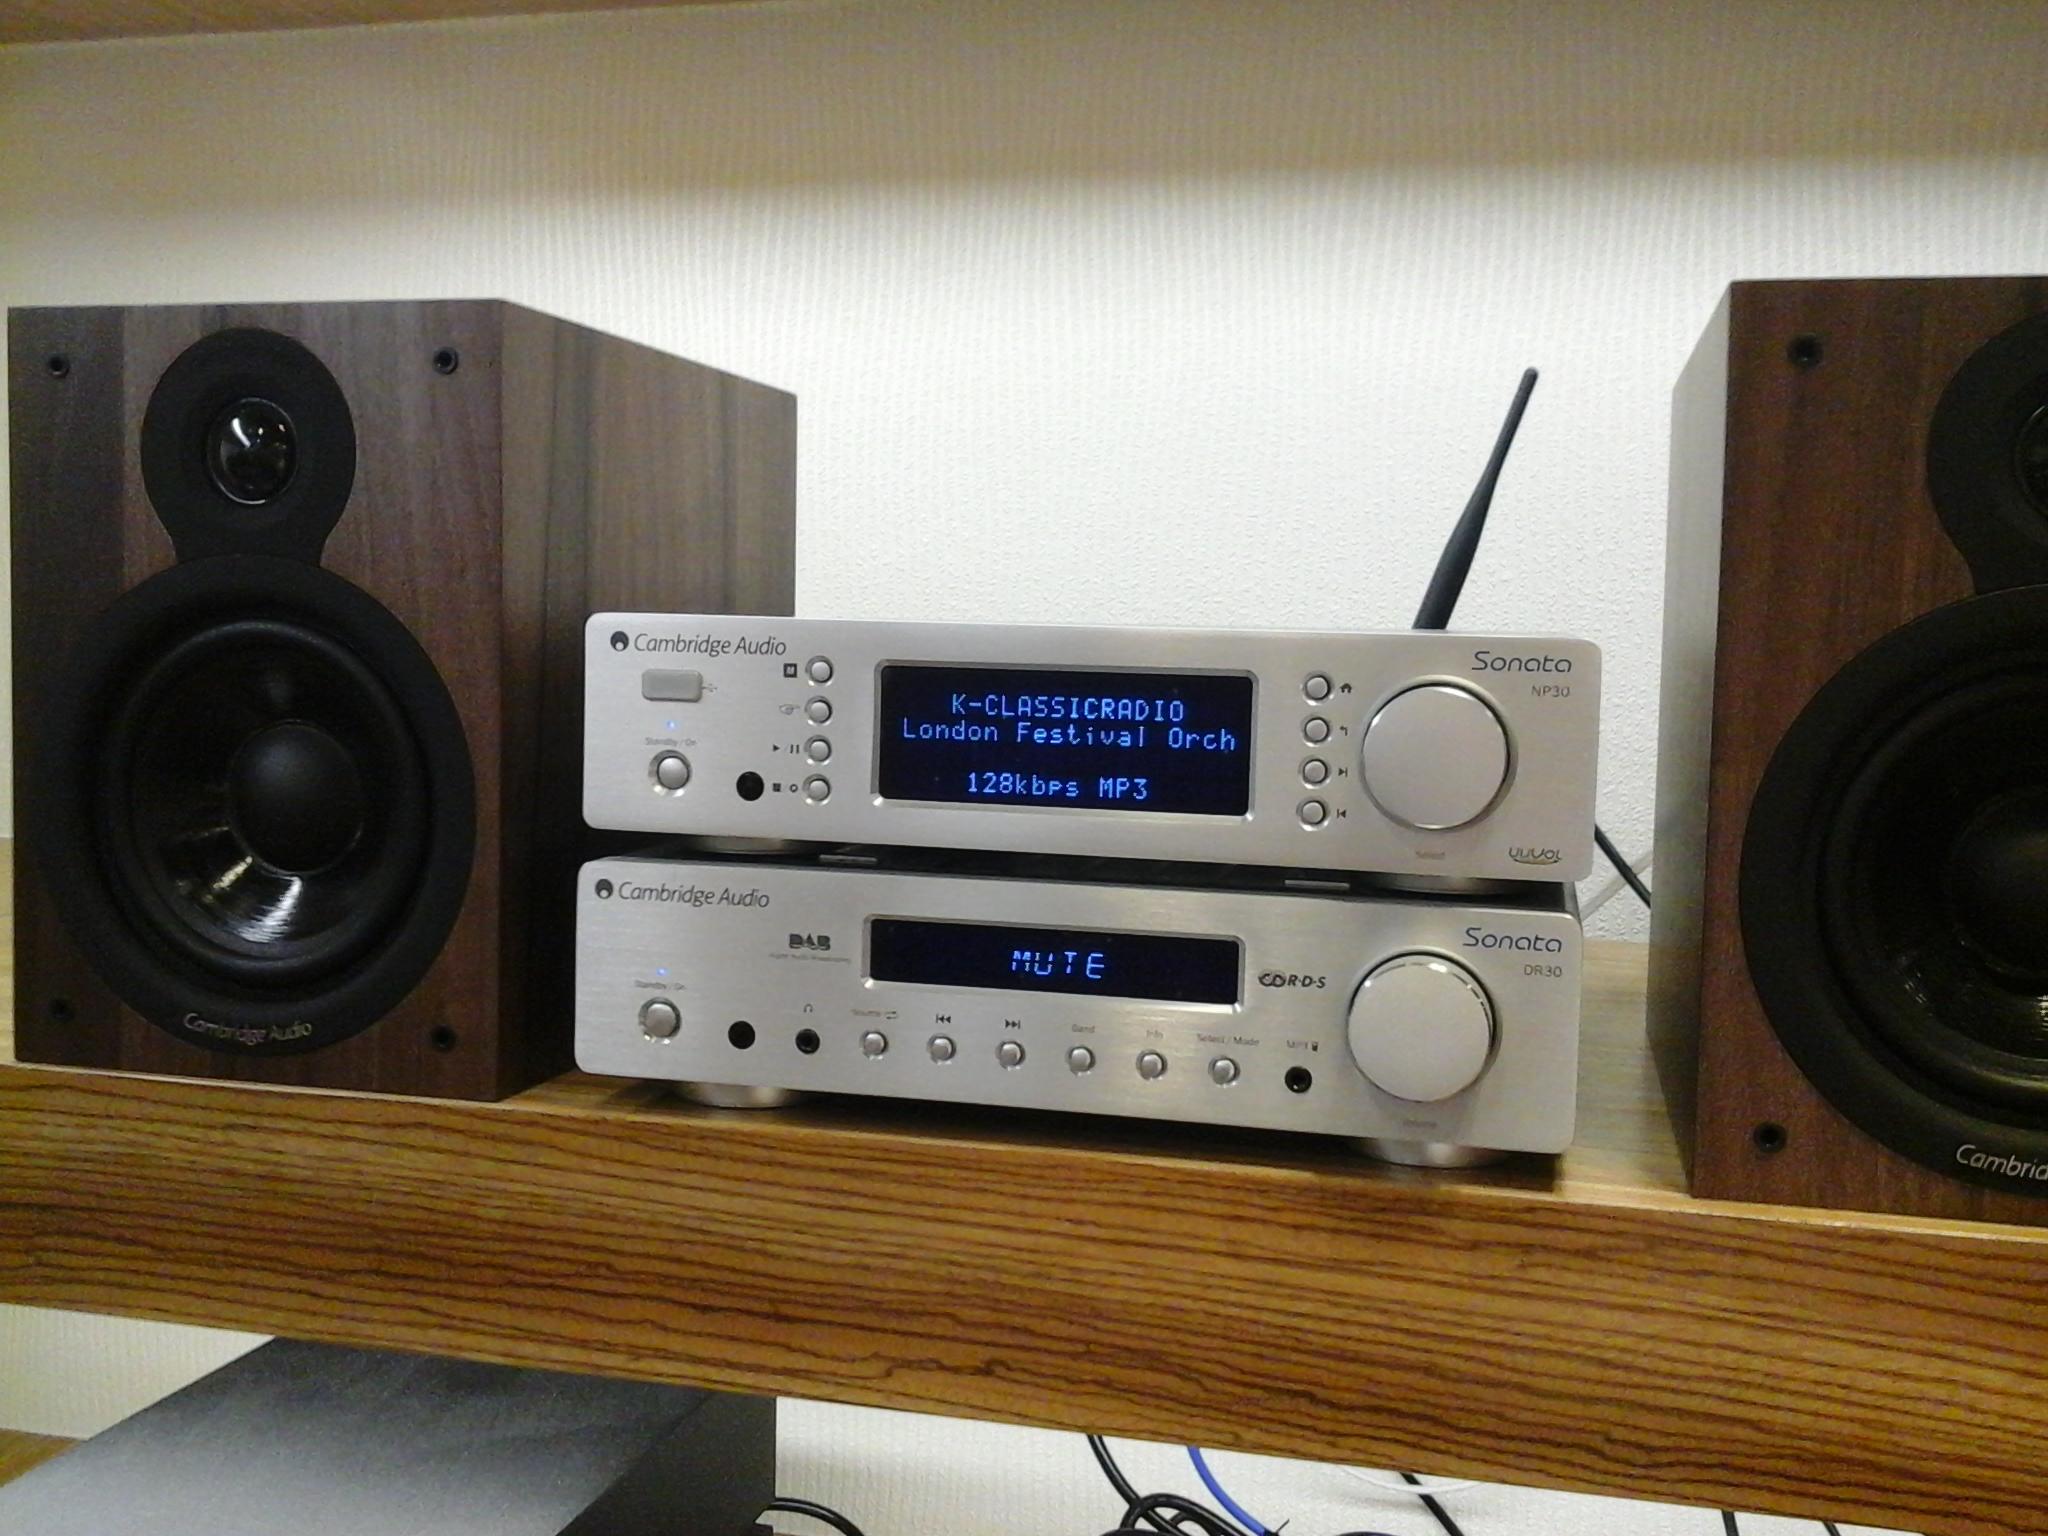 a9c7e457339 File Cambridge Audio mini-system.jpg - Wikimedia Commons